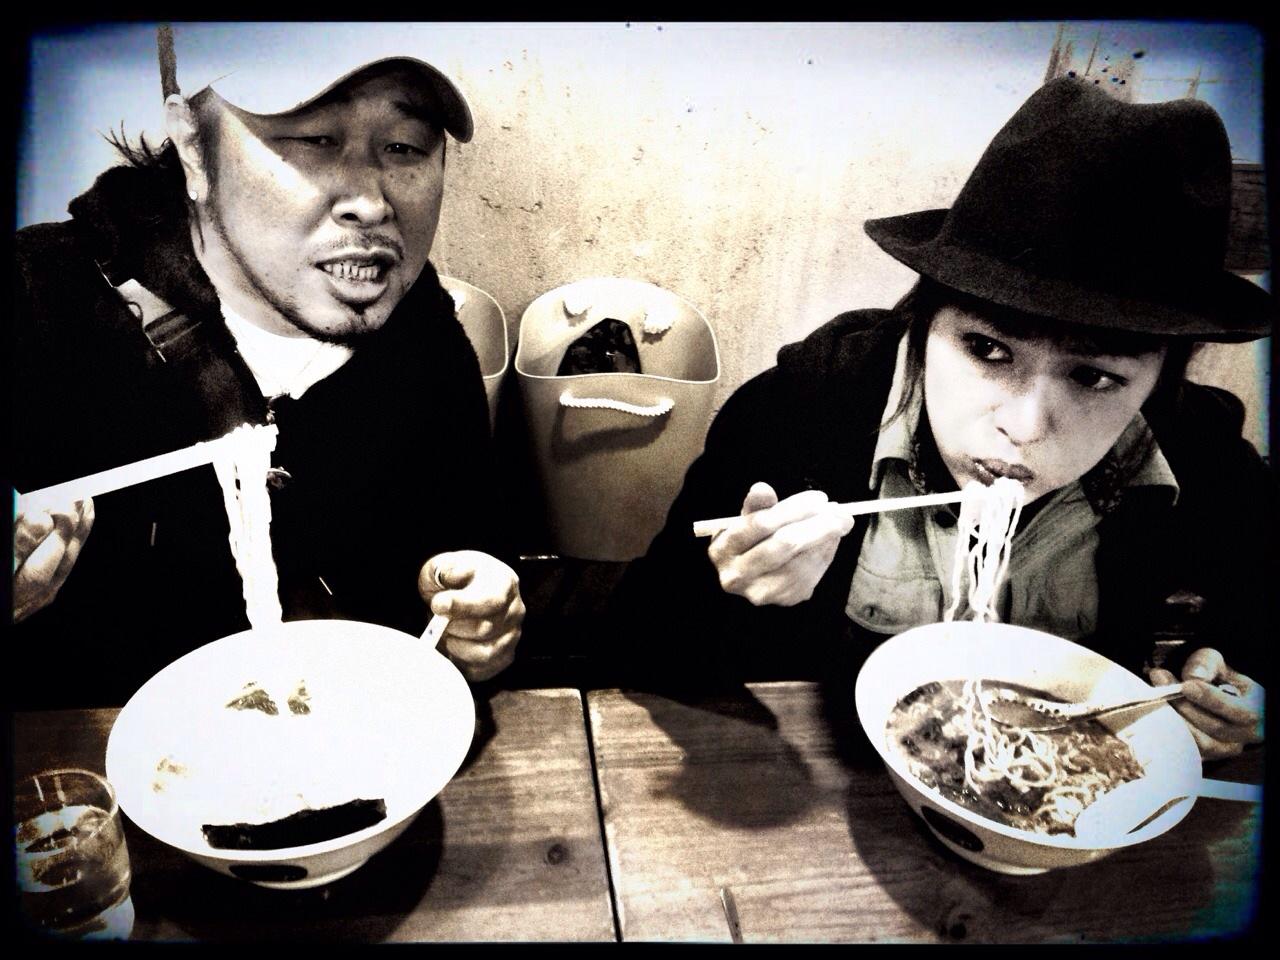 Gold Sounds presents『浅草慕情番外編』